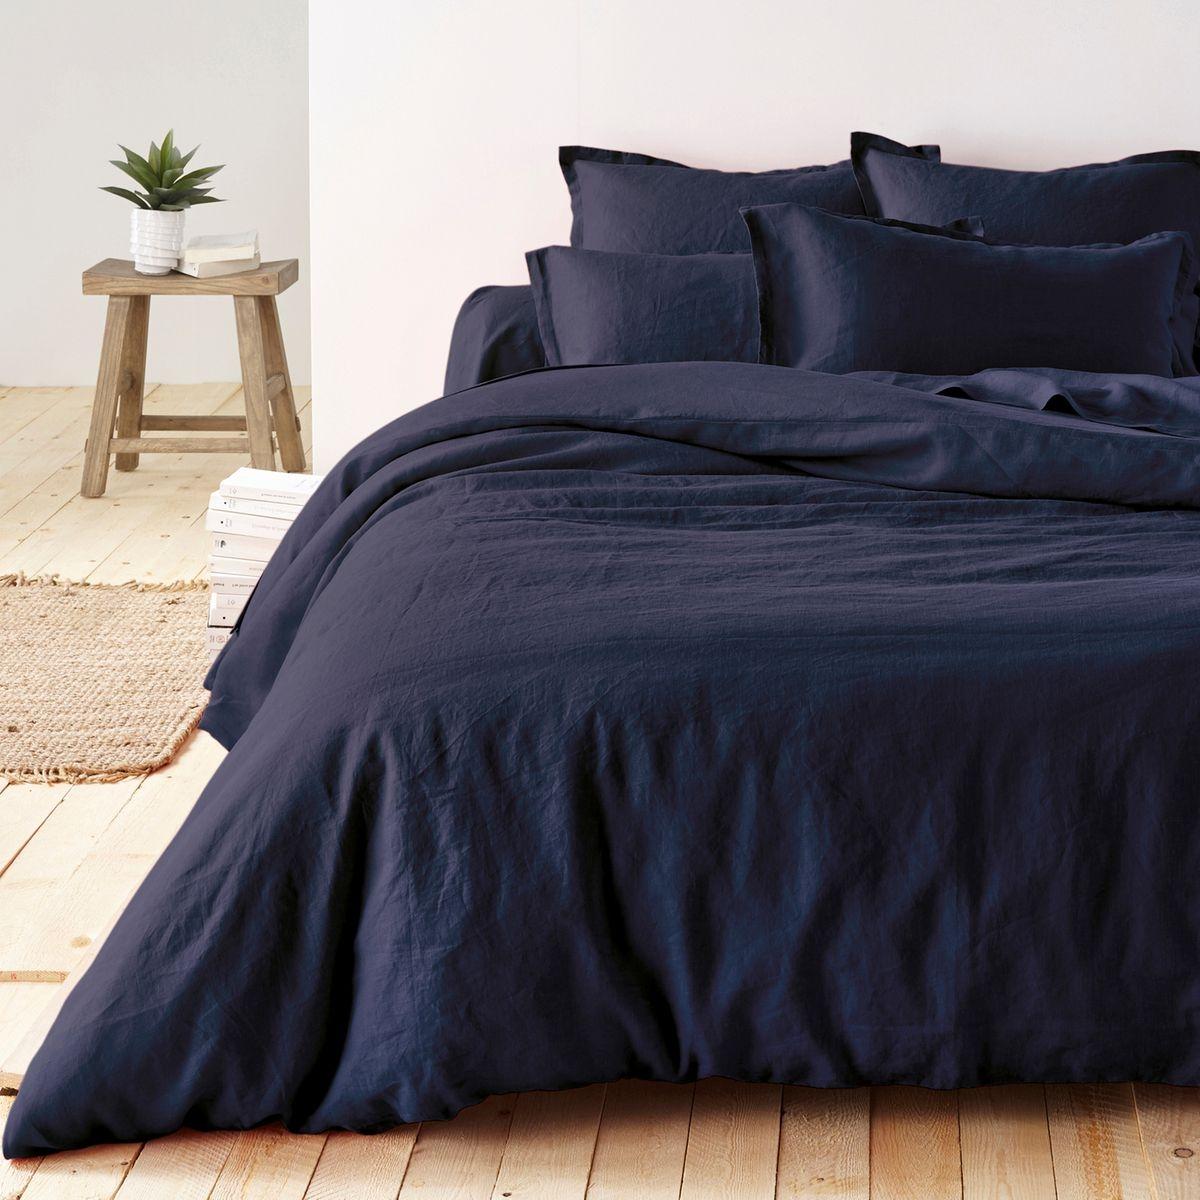 linge de lit la redoute tritoo. Black Bedroom Furniture Sets. Home Design Ideas